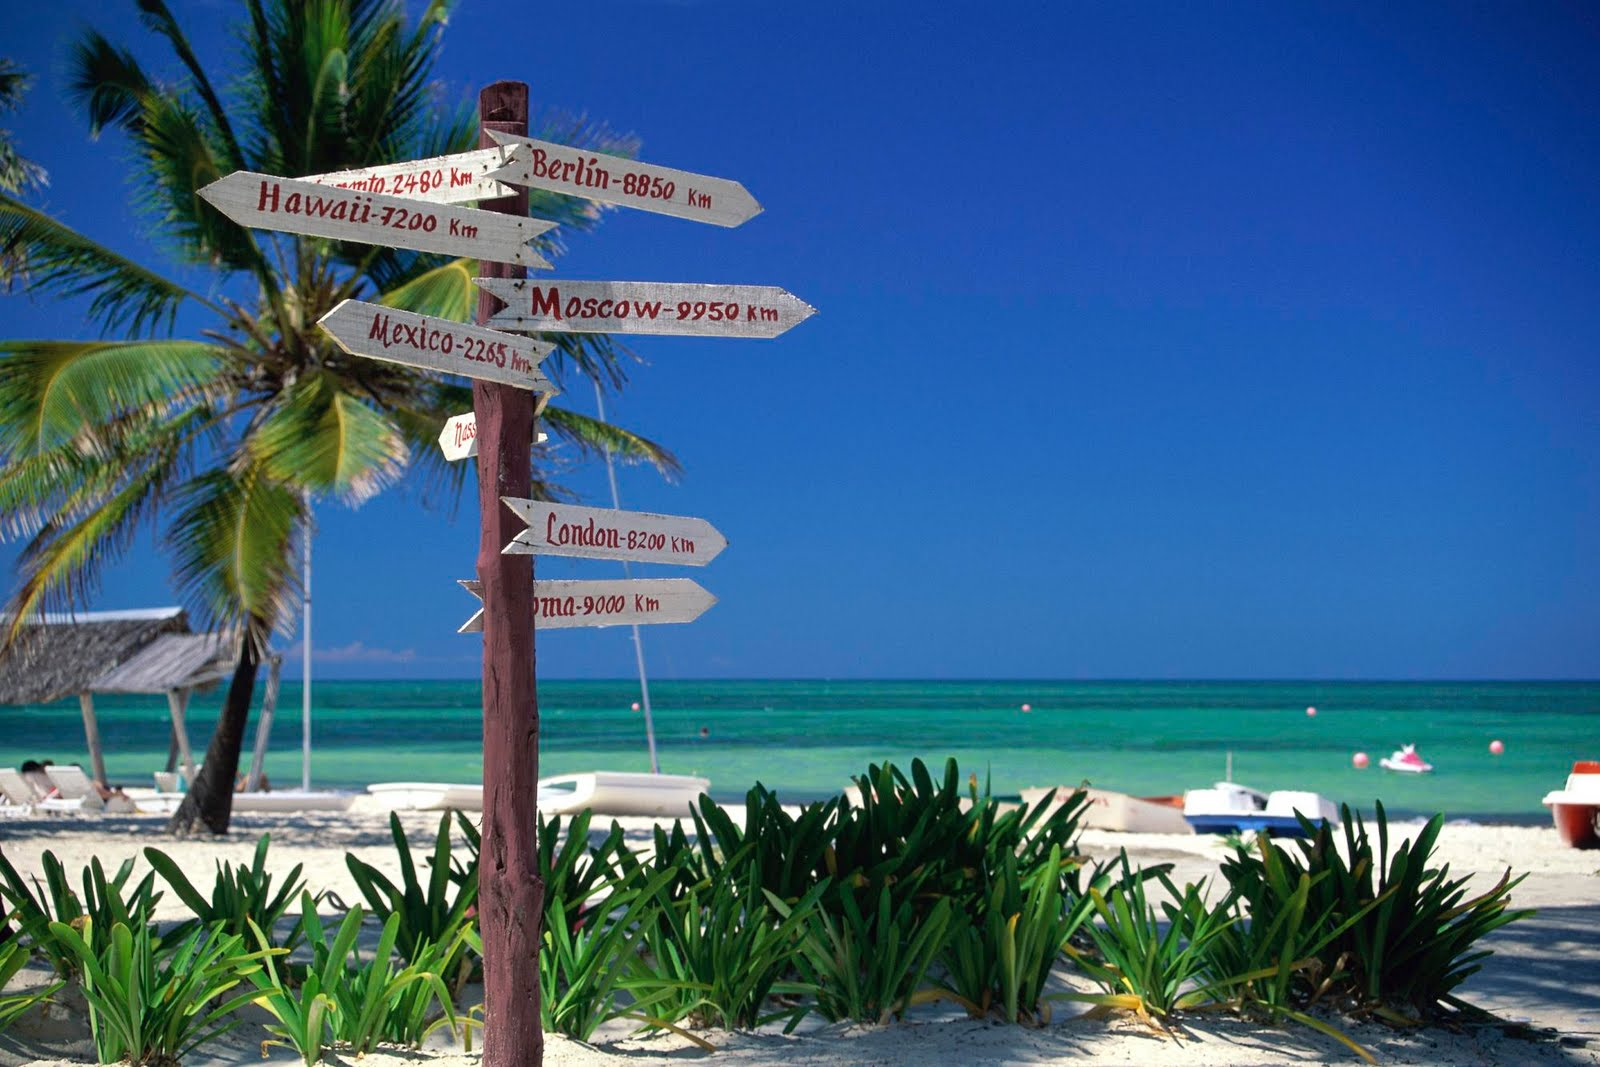 Where Is Cuba - Where is cuba